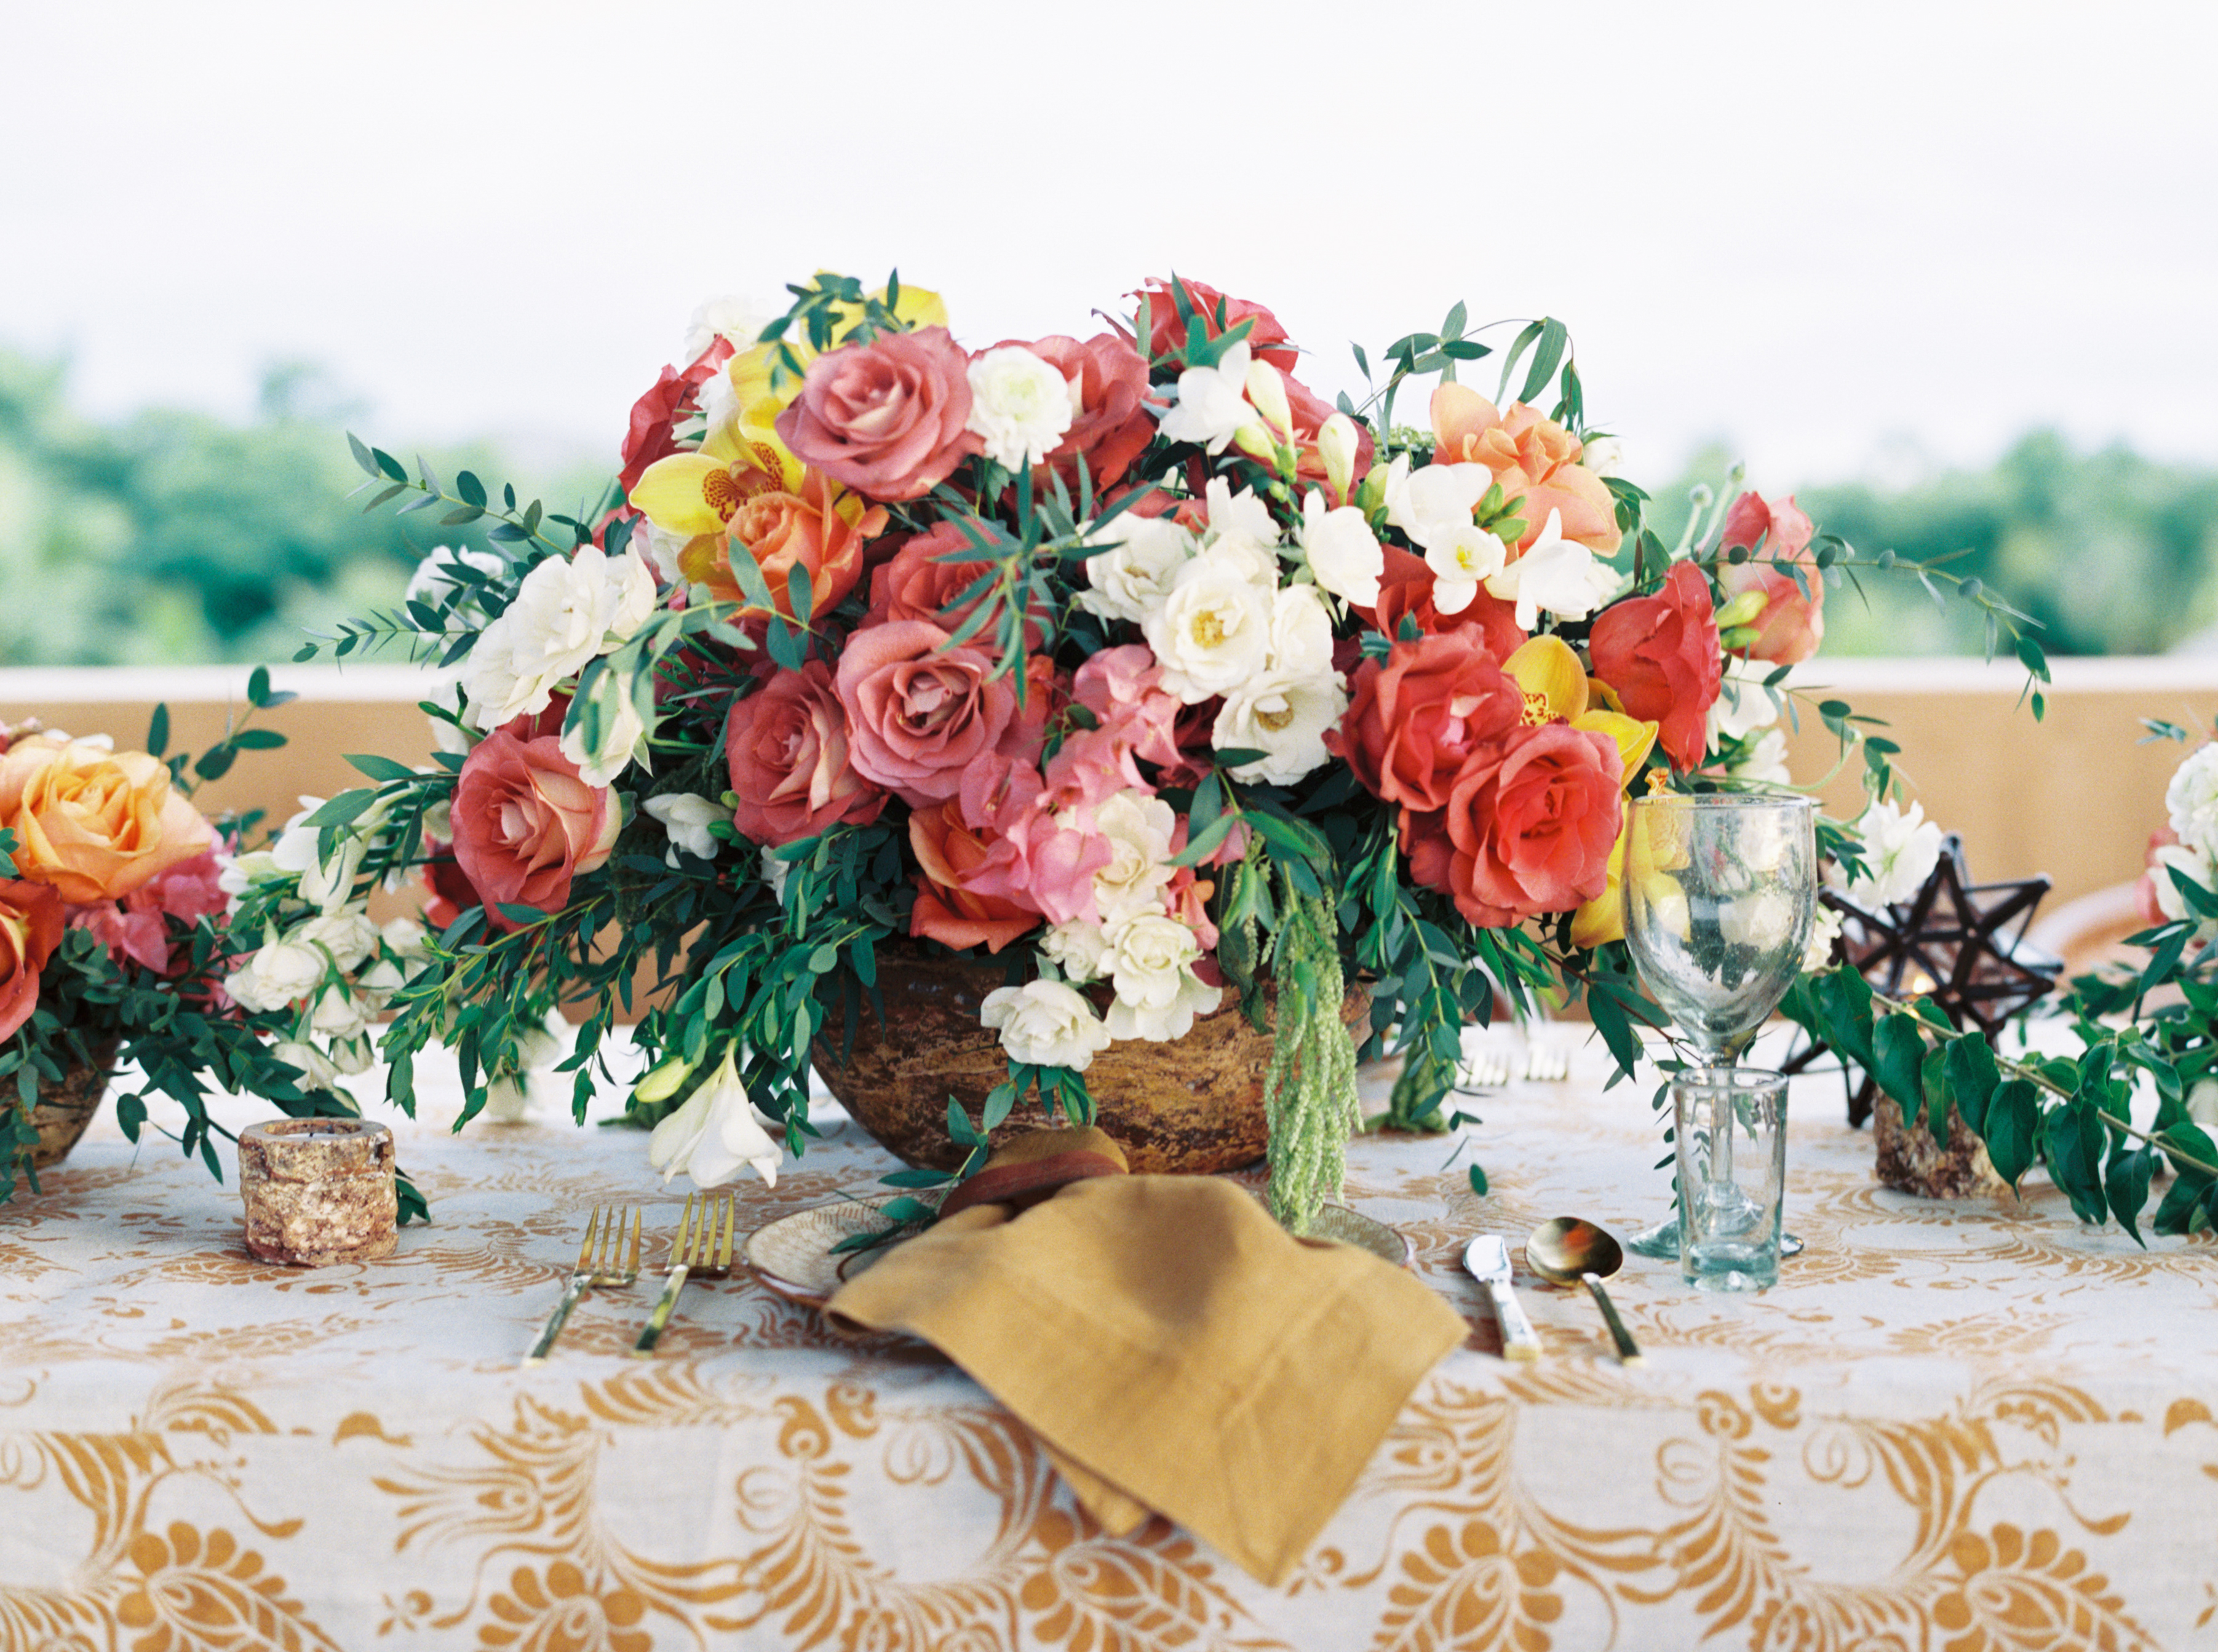 elena damy - a mexican-themed wedding centerpiece we love